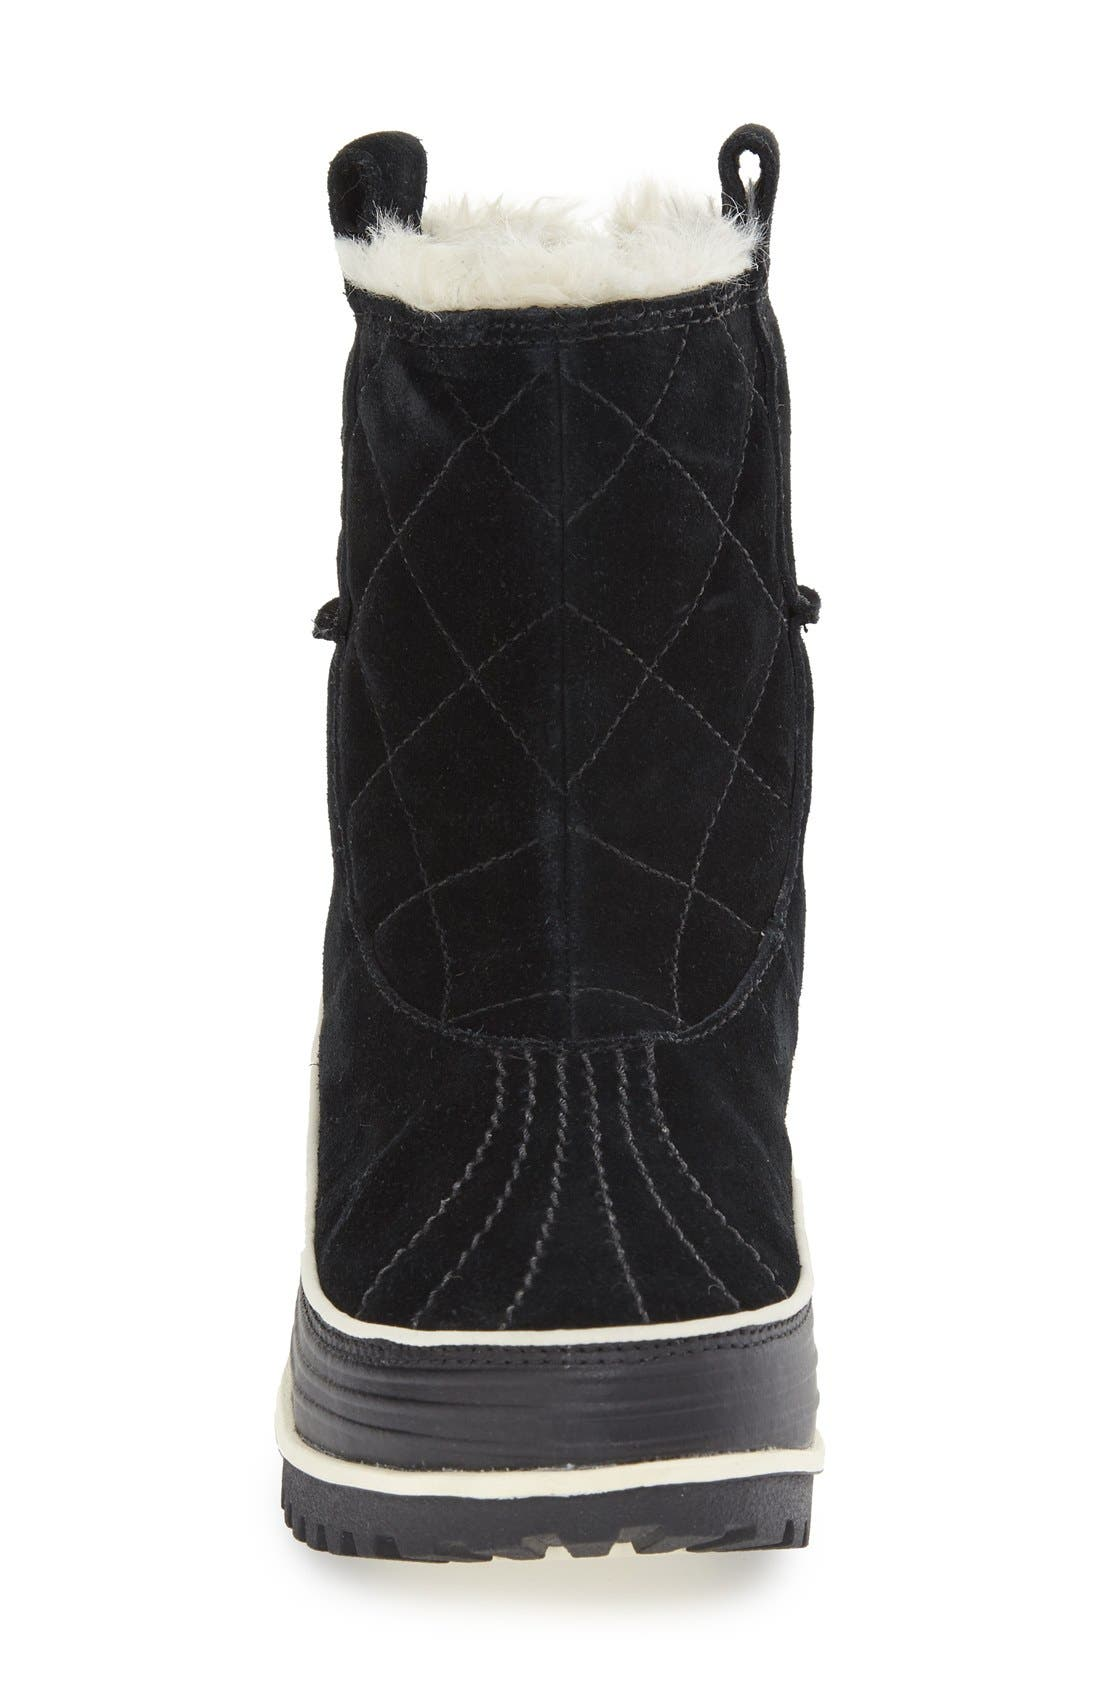 Alternate Image 3  - SOREL 'Tivoli II' Waterproof Snow Boot (Women)